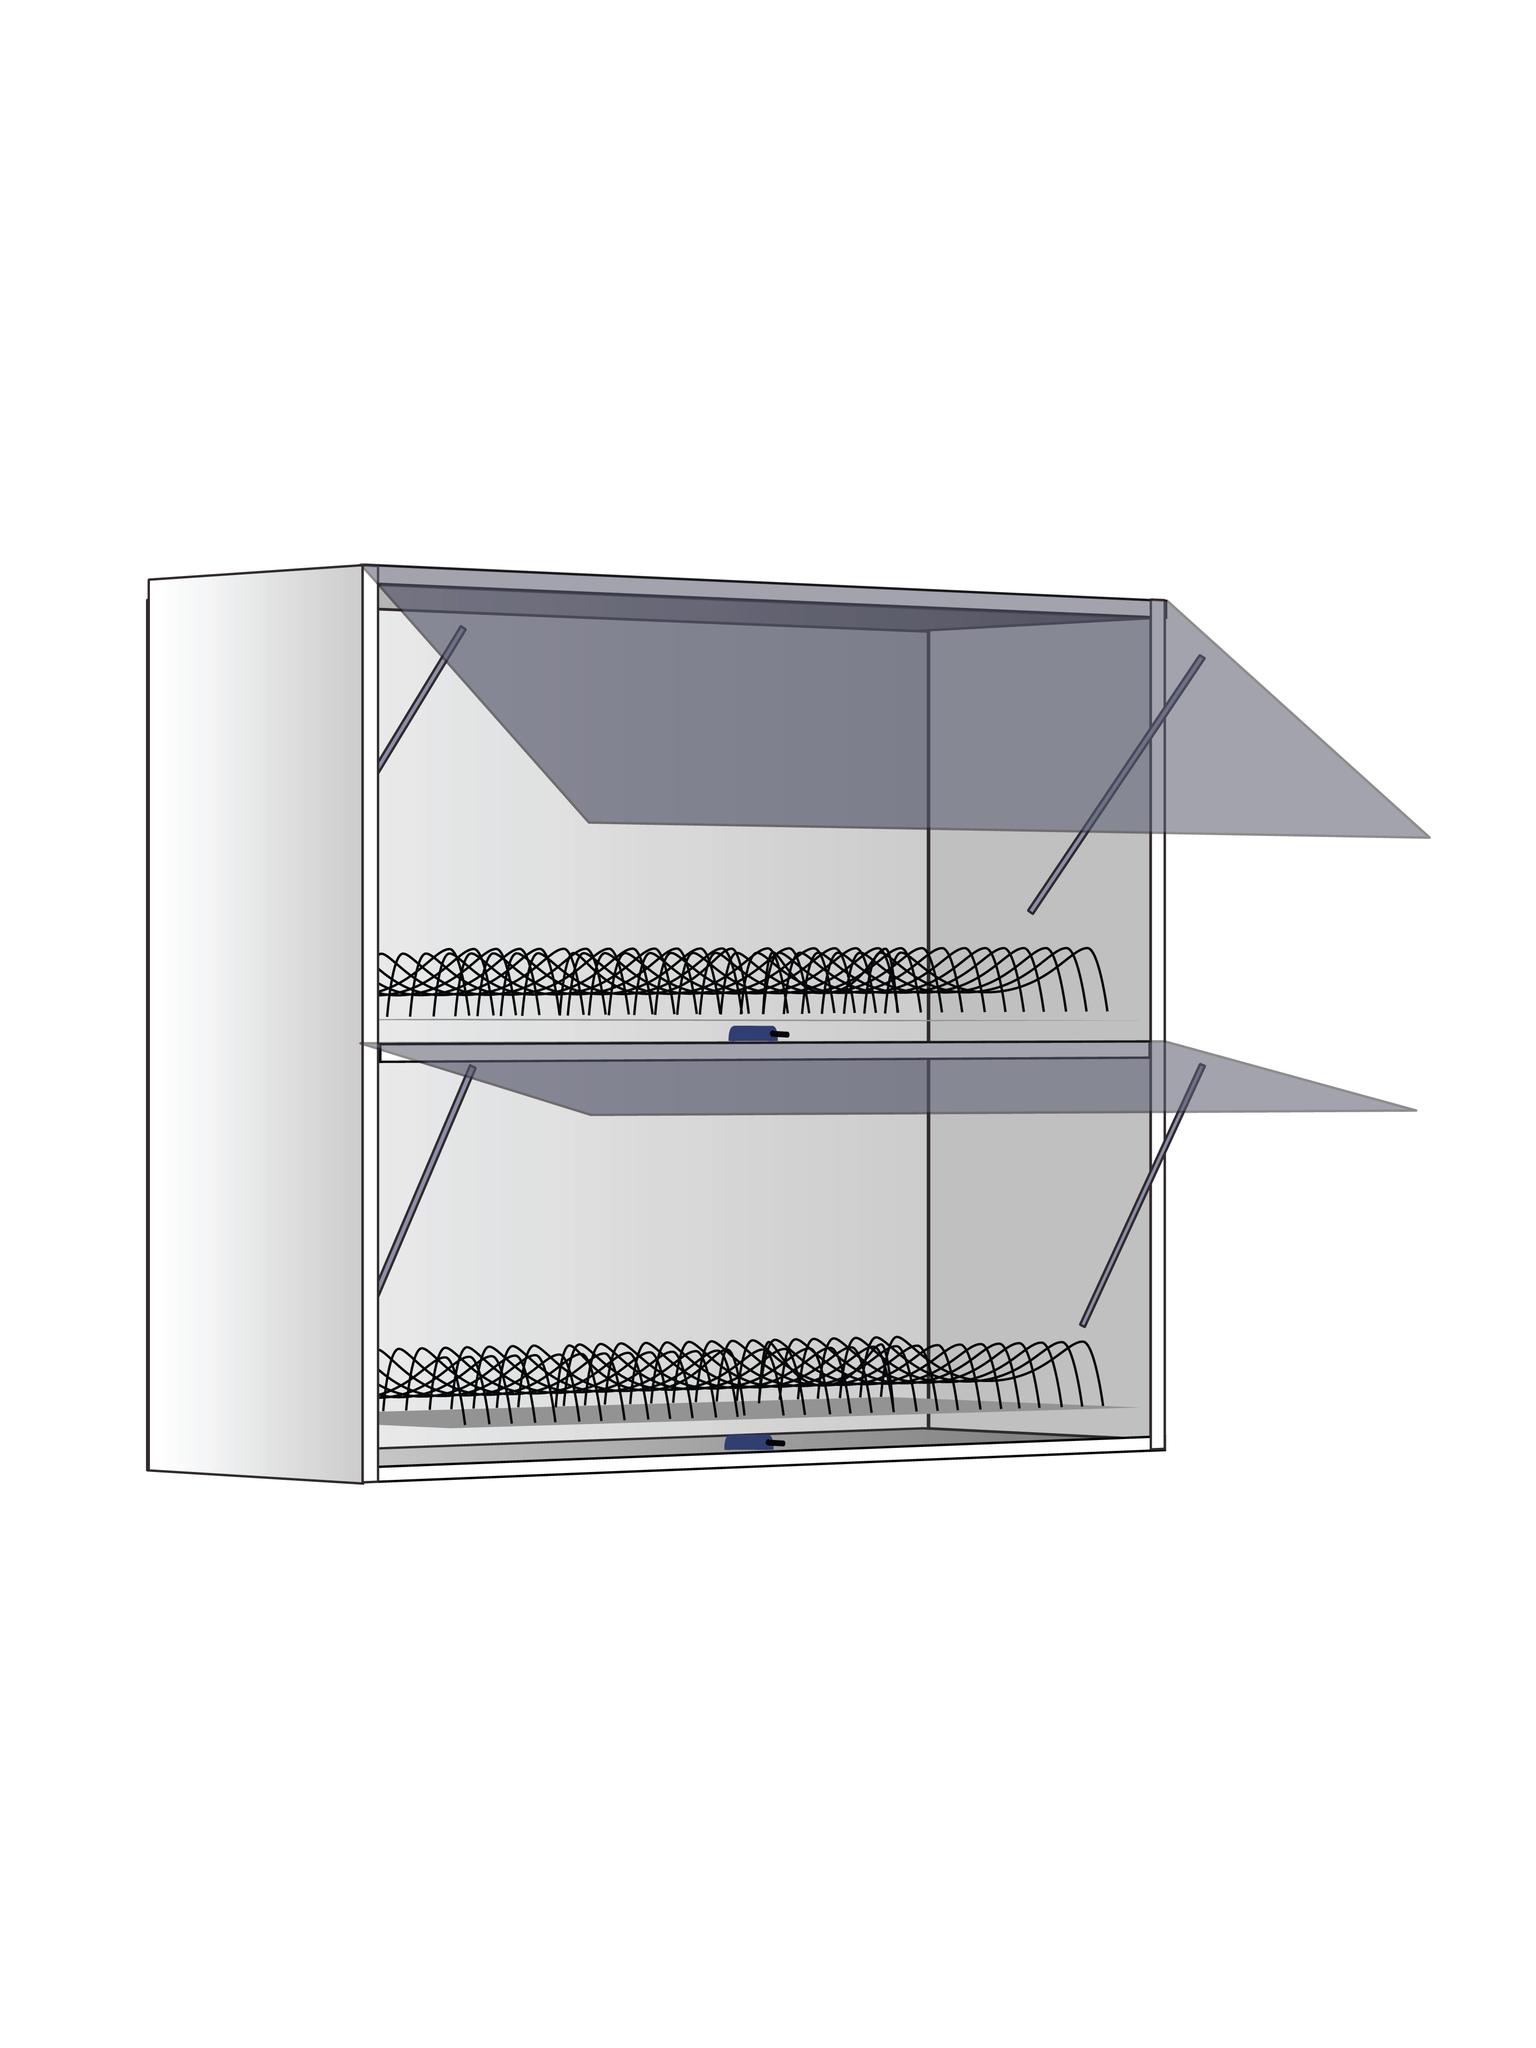 Верхний шкаф с сушилкой и  газлифтами, 720Х800 мм / PushToOpen